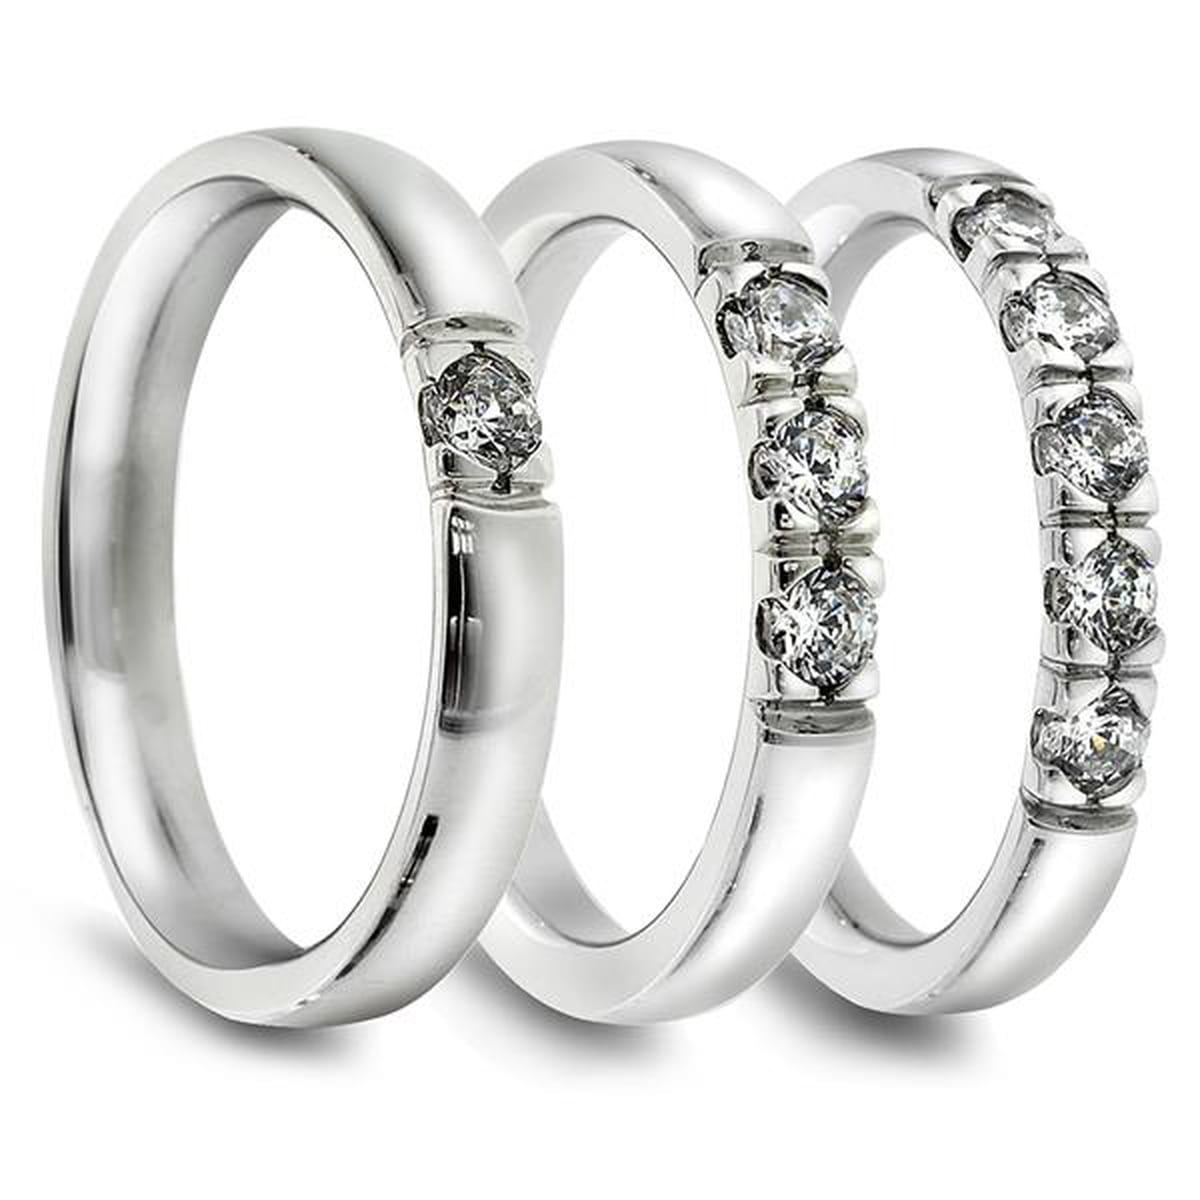 Lady Alliansering. 3 stk 0,07 ct diamanter.